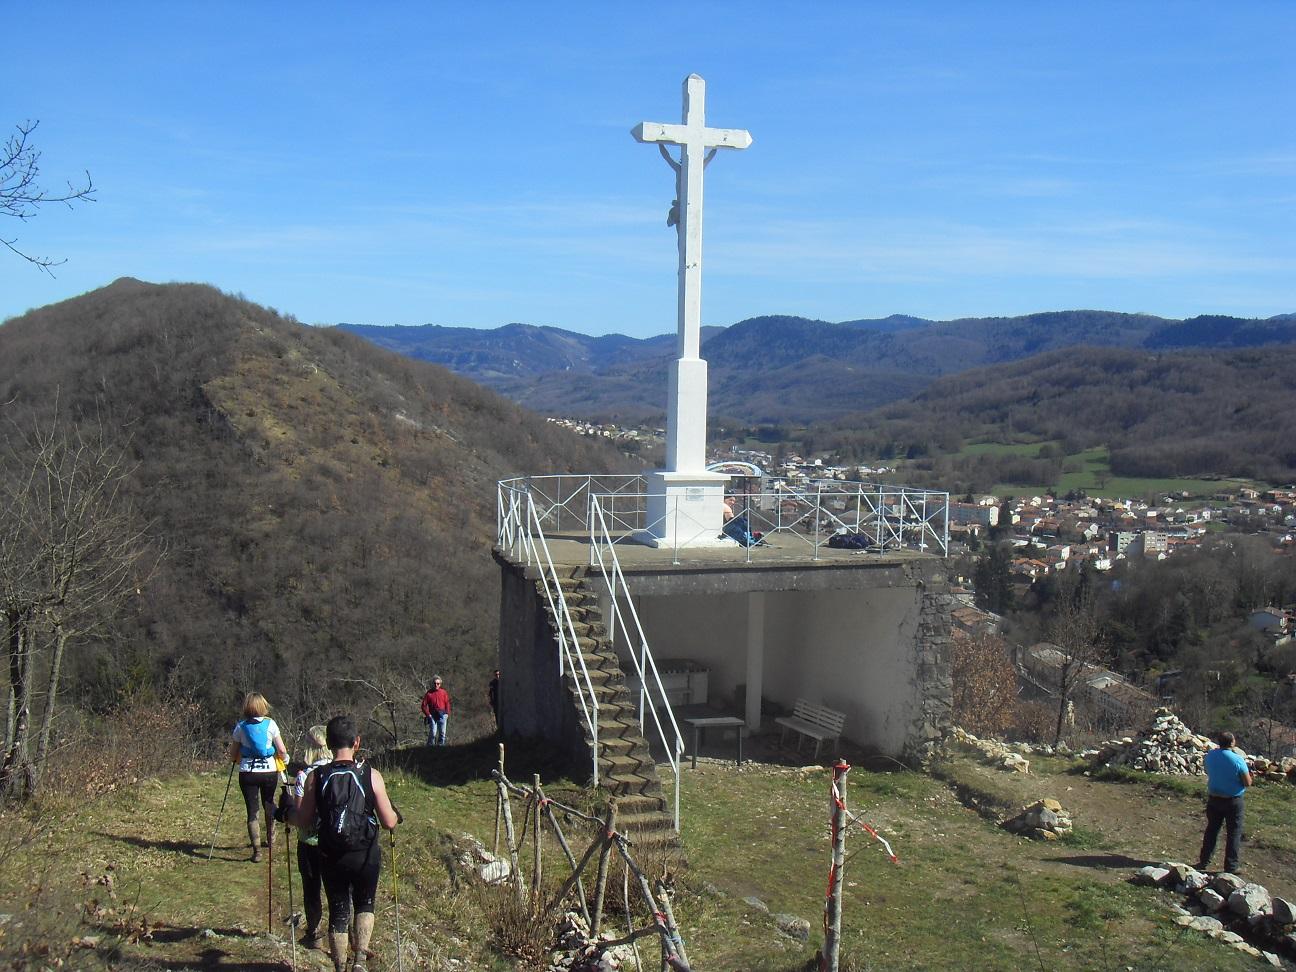 73-Aah, c'est la croix qui marque la fin.. de notre chemin de croix..